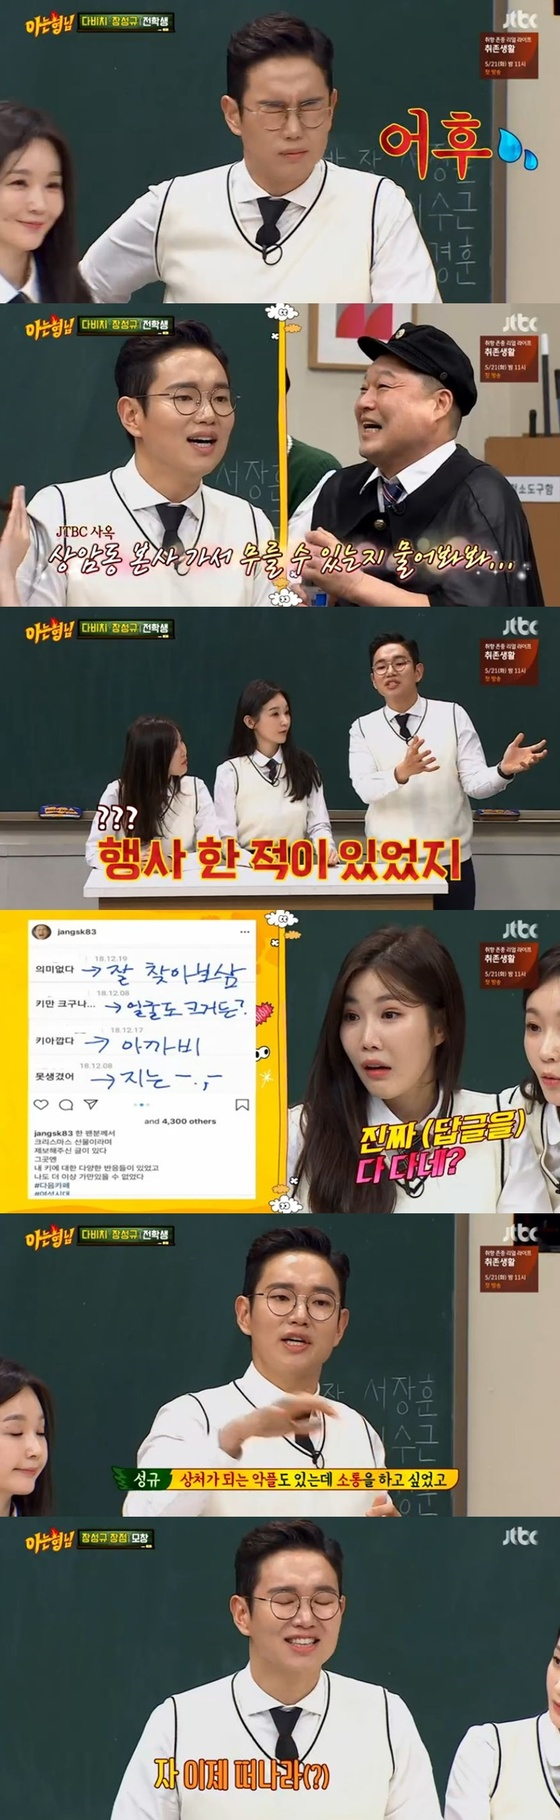 [RE:TV] 장성규, '아는형님' 고정멤버로 손색 없는 '프리'한 입담